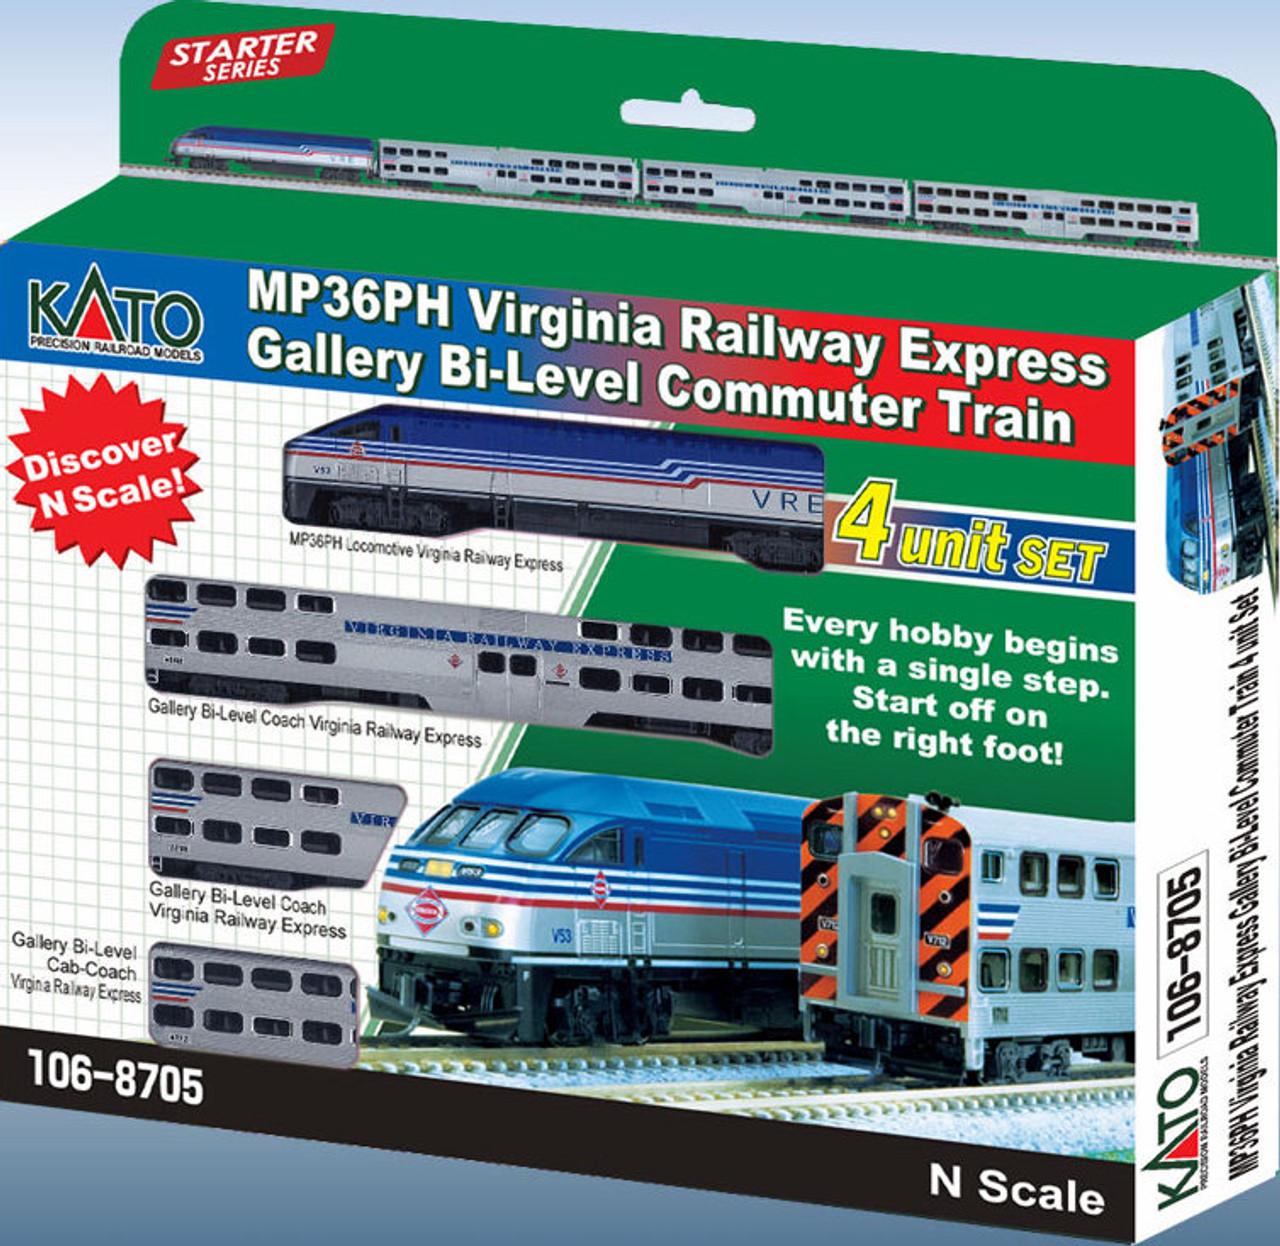 Kato N 1068705 MP36PH Virginia Railway Express Gallery Bi-Level Commuter  4-Unit Train Set